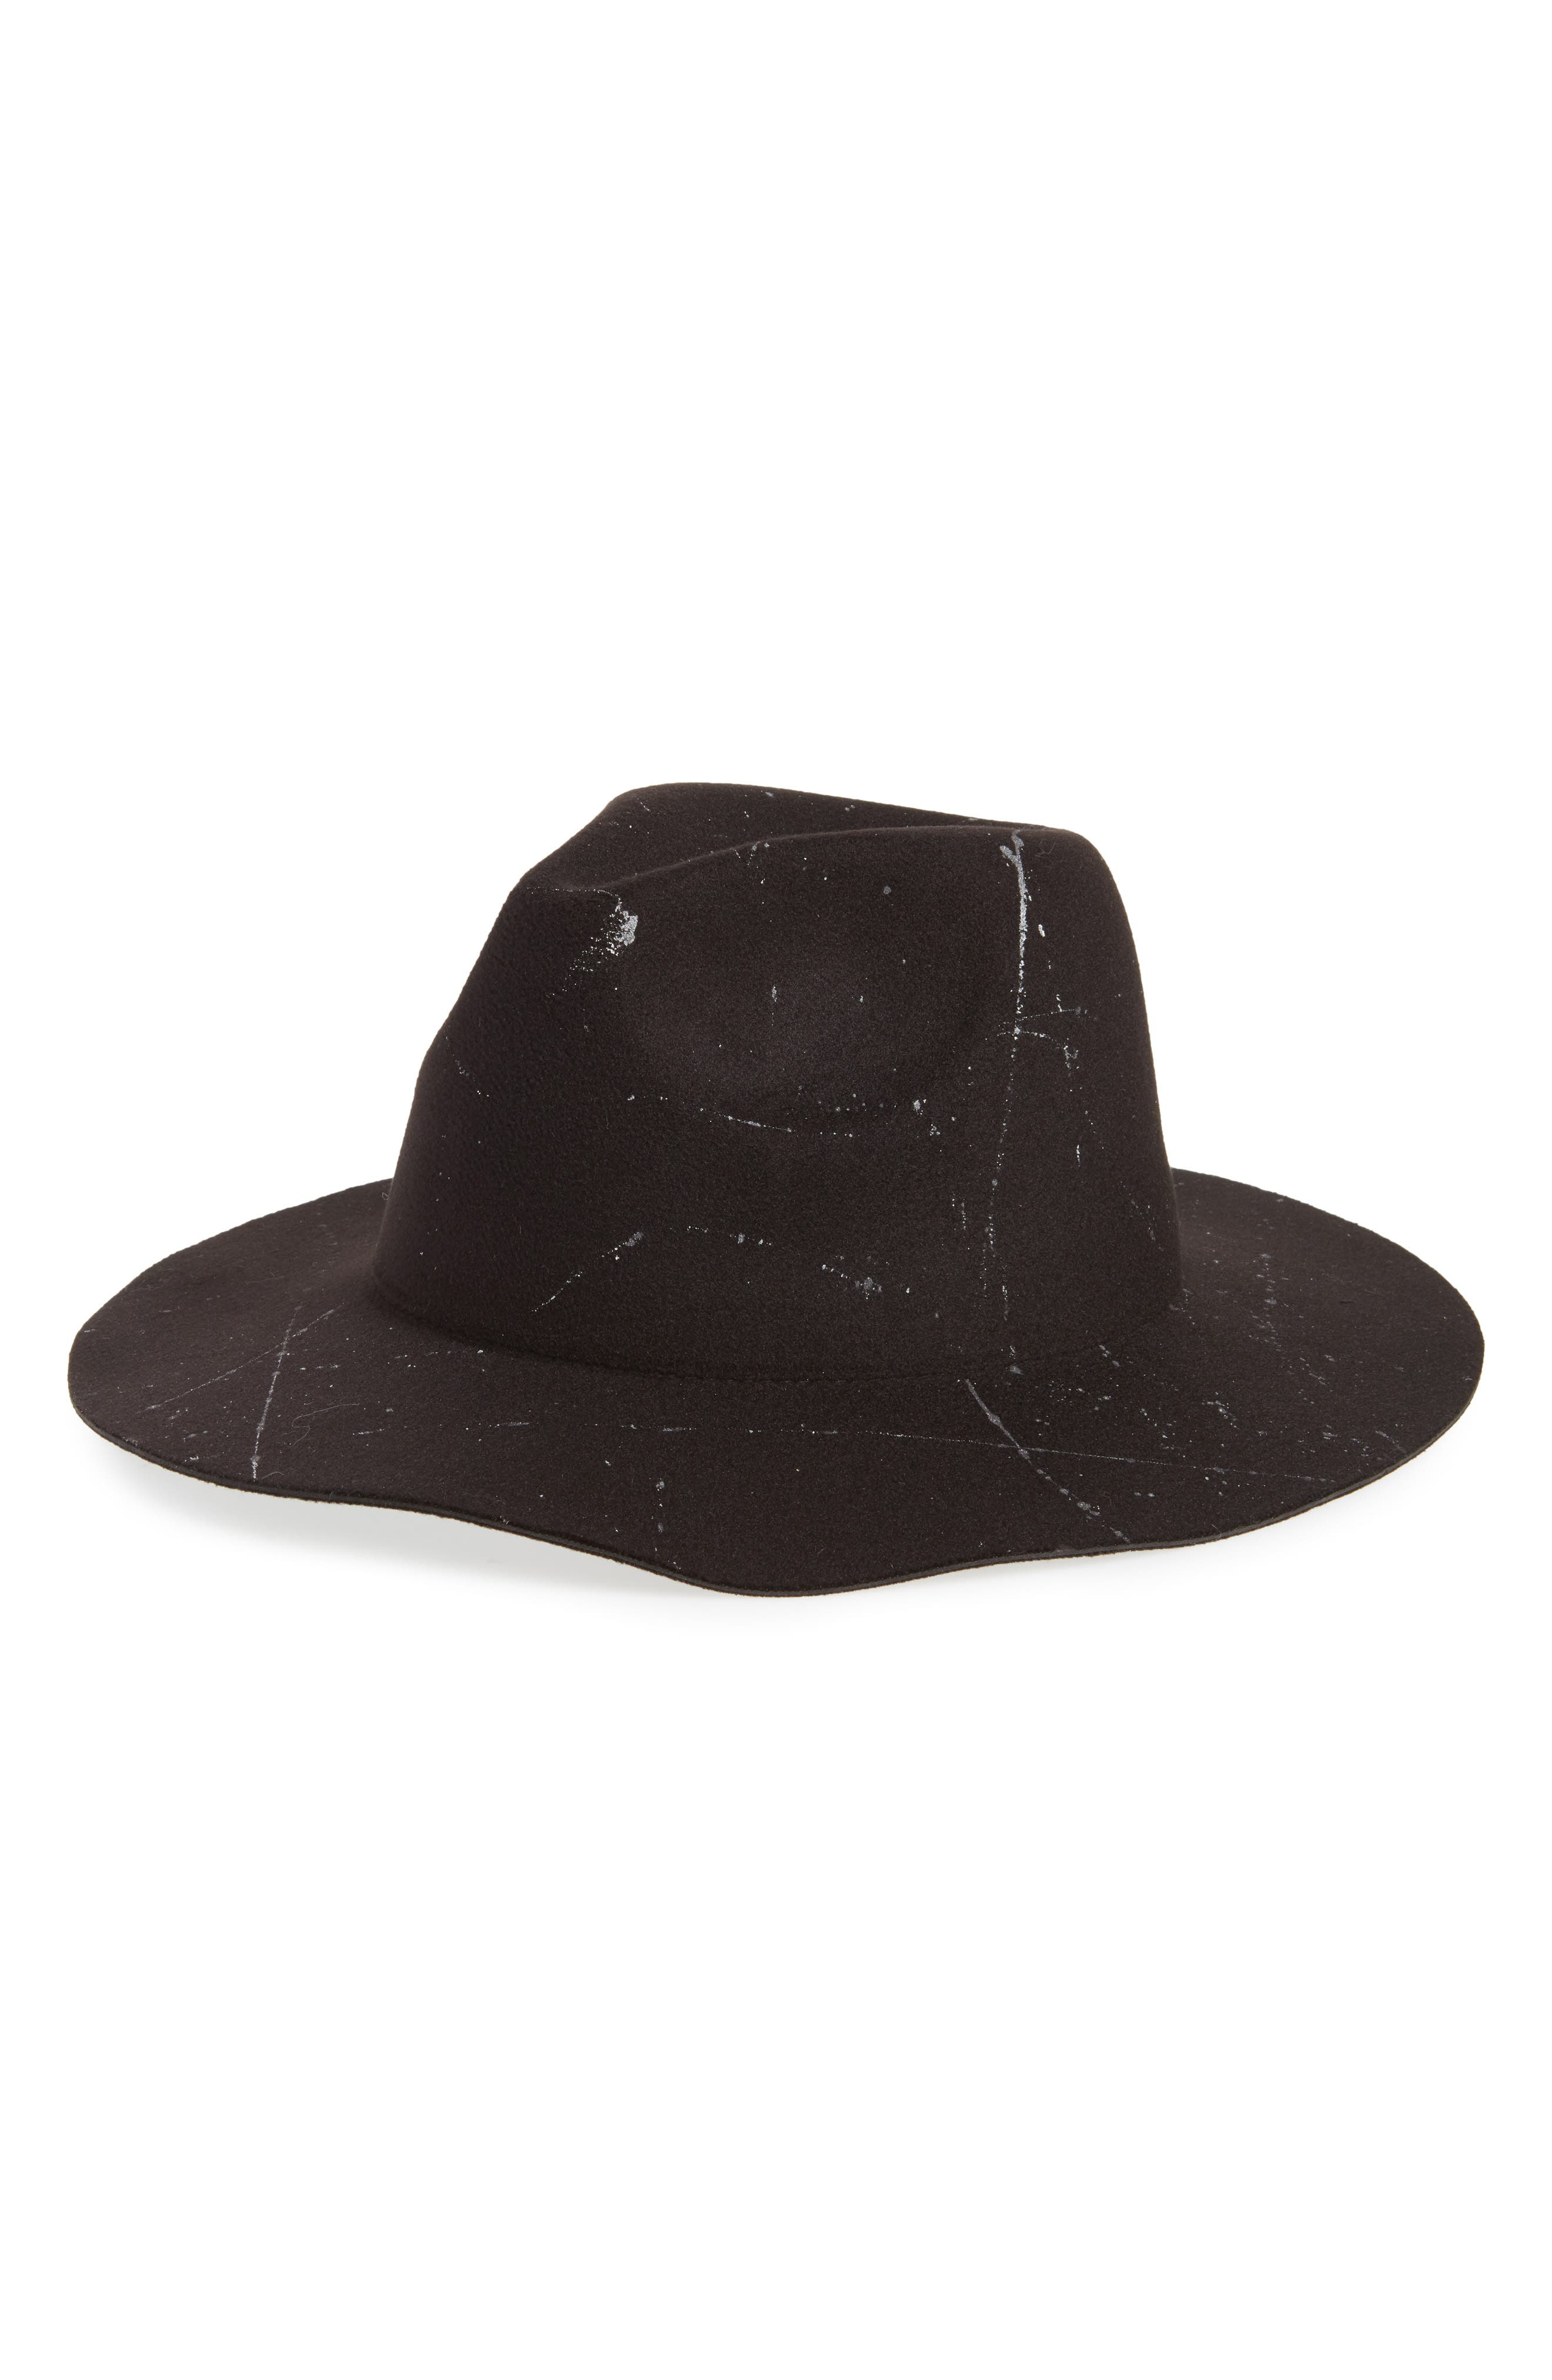 Marbled Paint Felt Panama Hat,                             Main thumbnail 1, color,                             001